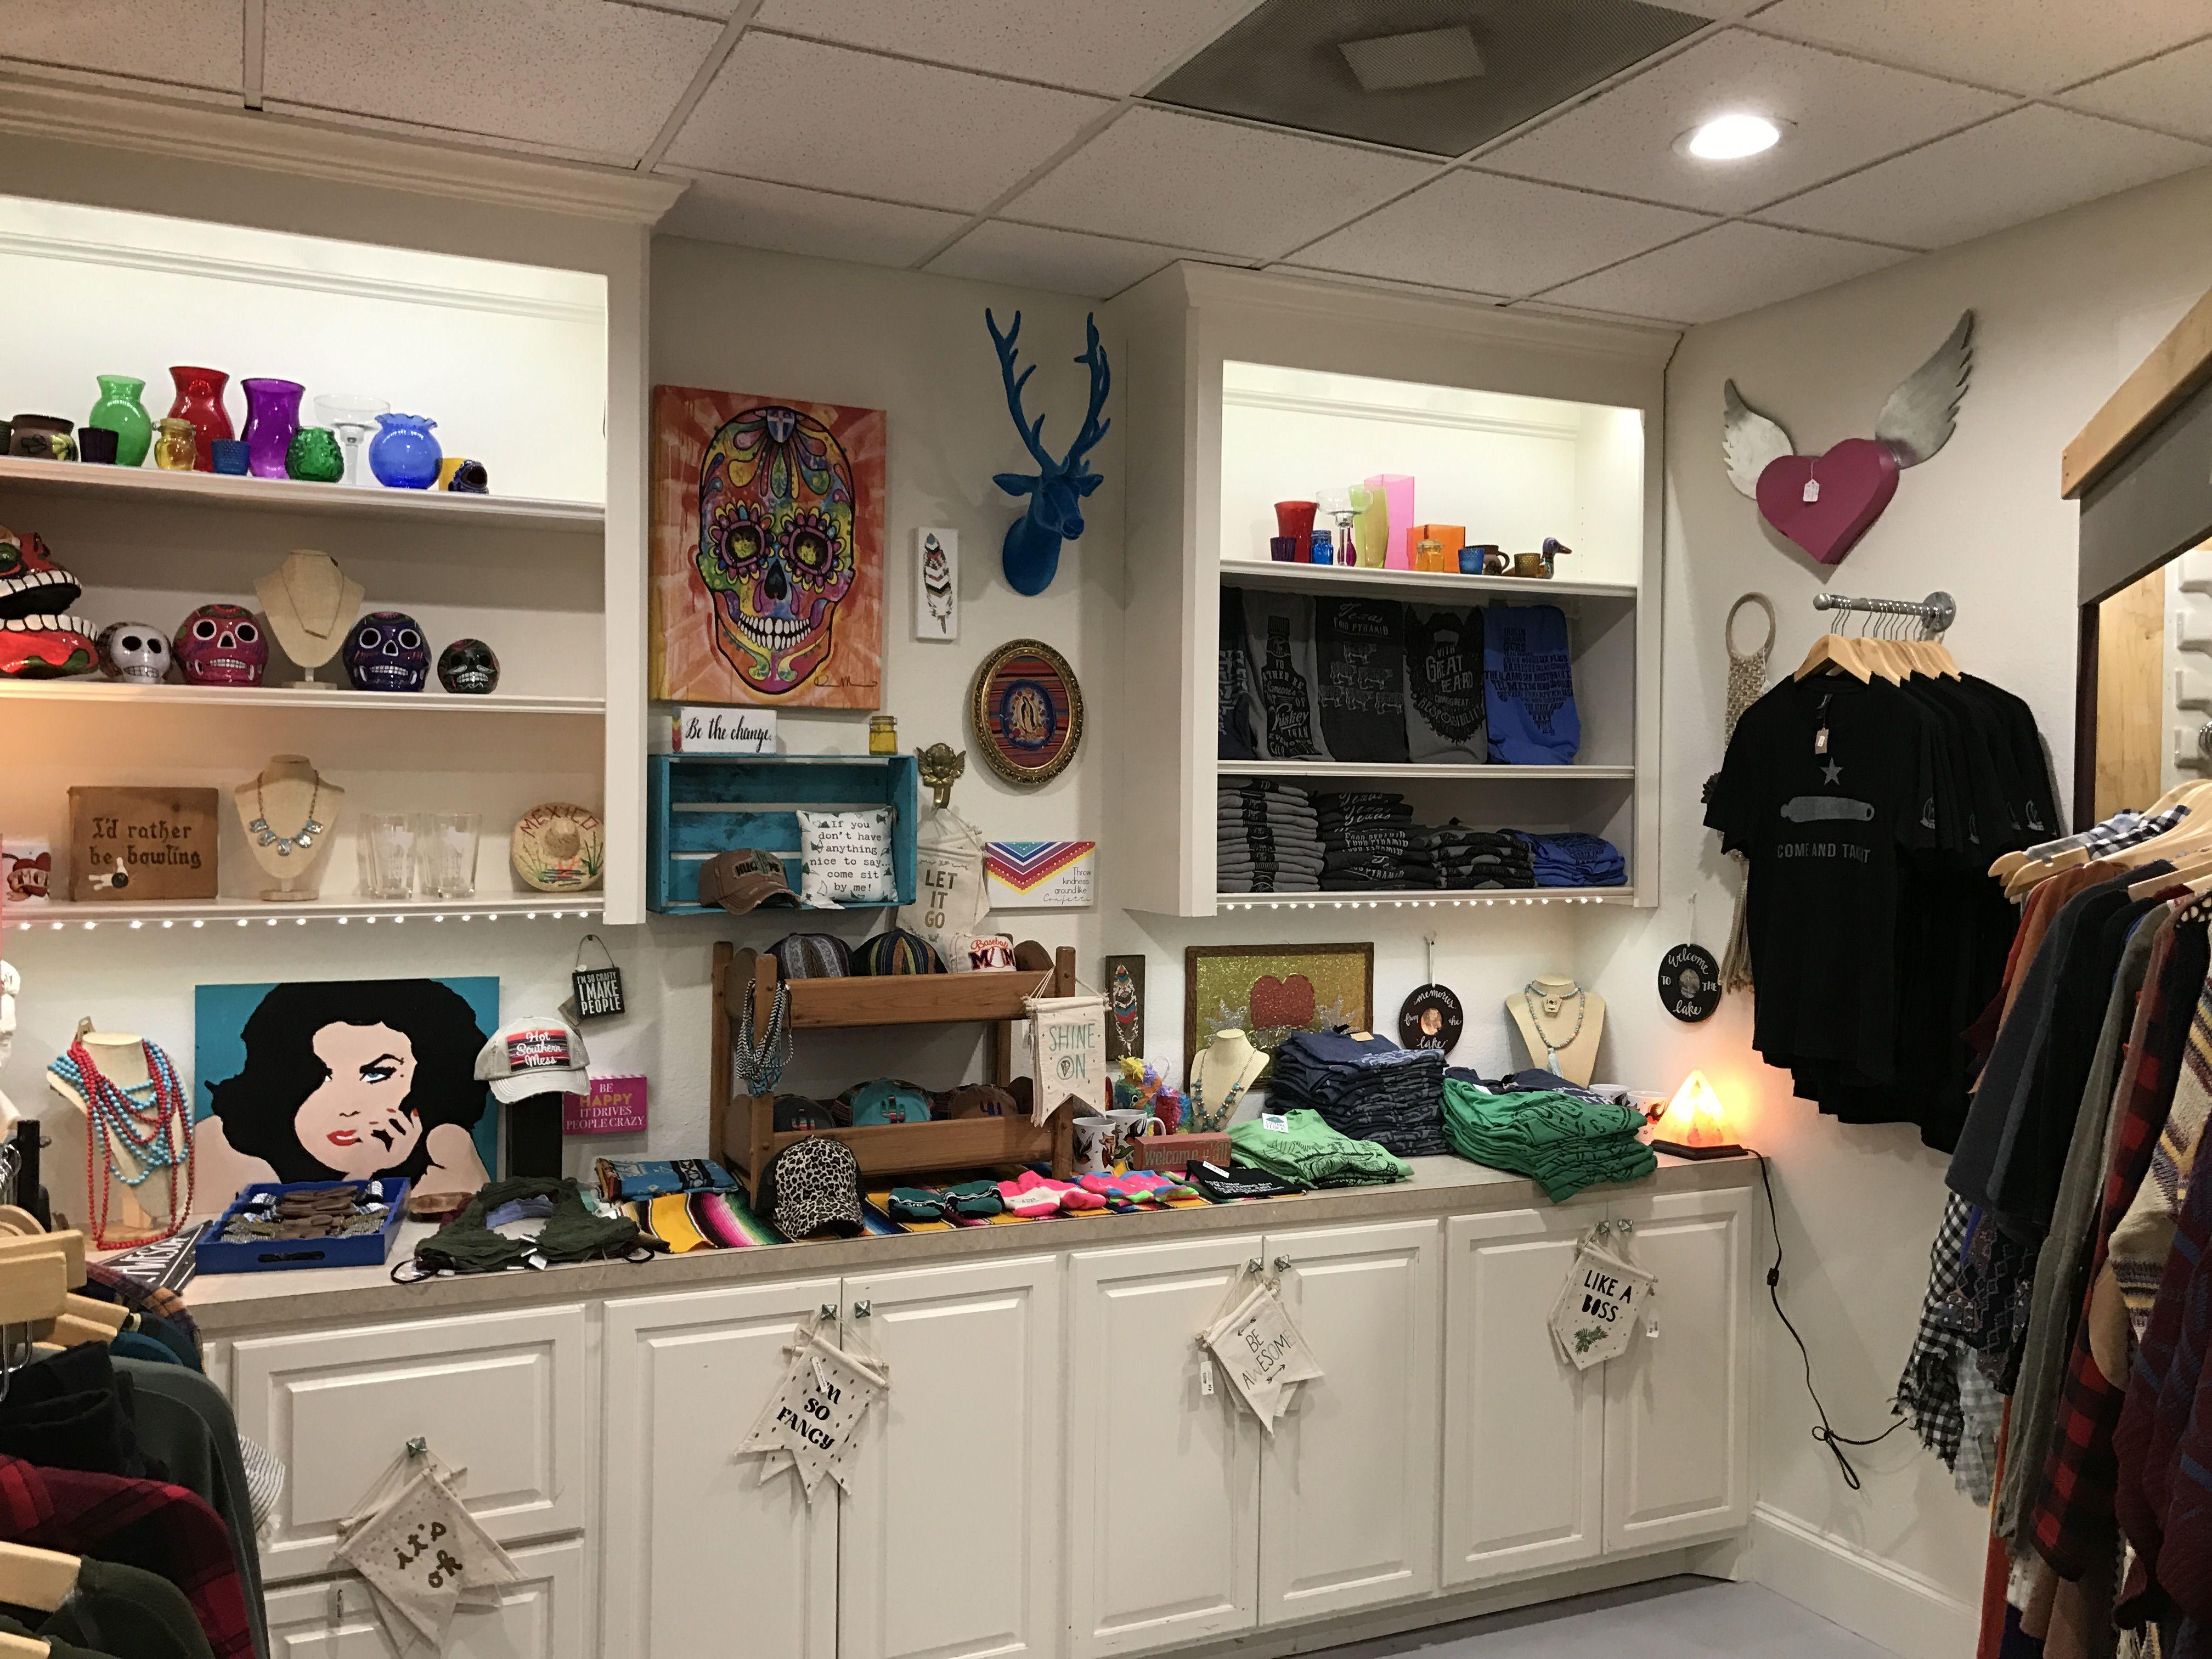 Merchandising, visual merchandising, fiesta theme, faux taxidermy, sugar skull, day of the dead, fiesta, boutique merchandising, boutique wall